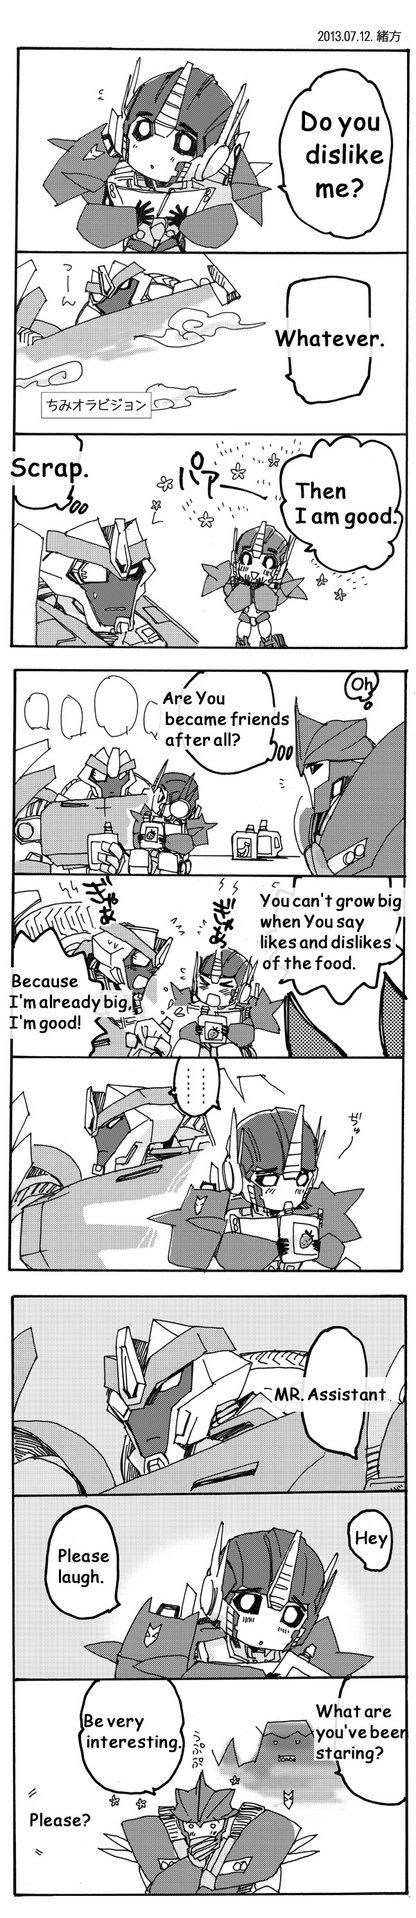 chimi_optimus_and_breakdown_3_in_english_by_ogata_dragon_fight-d6tke4d.jpg (416×1918)